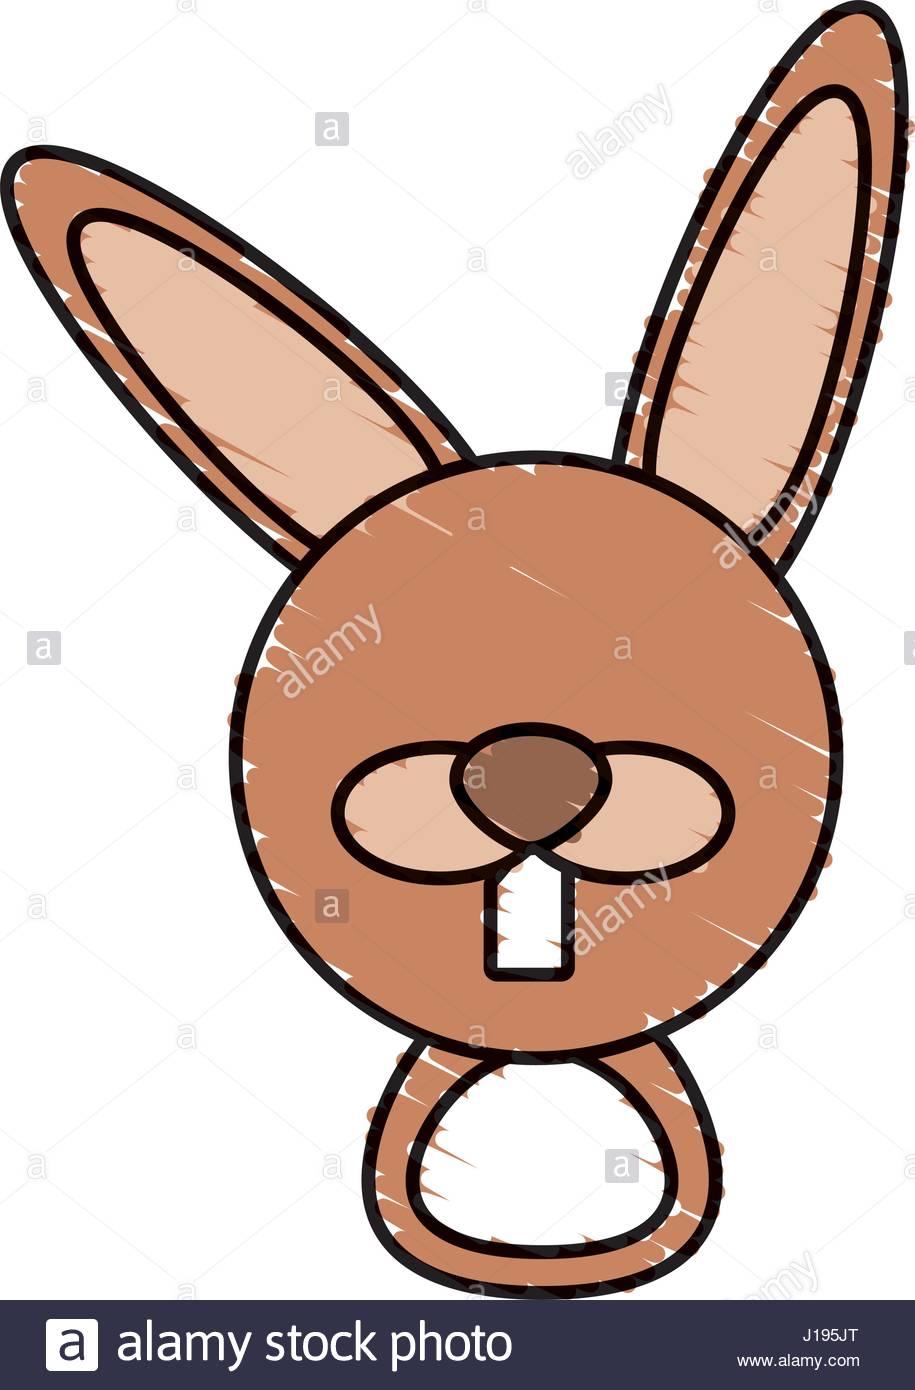 915x1390 Drawing Rabbit Face Animal Stock Vector Art Amp Illustration, Vector